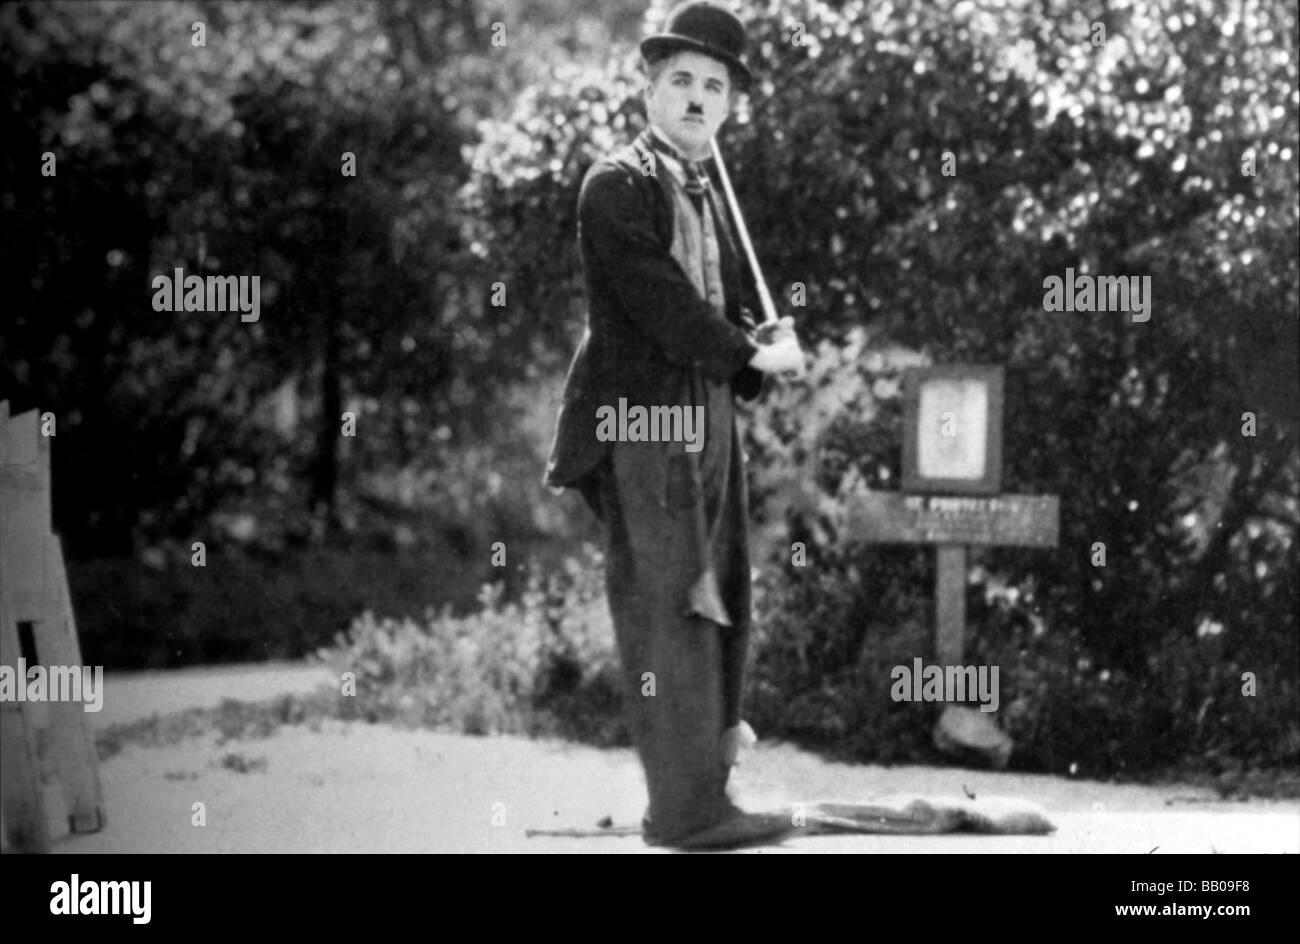 The idle class / Vanity Fair Year : 1921 Director : Charlie Chaplin Charlie Chaplin - Stock Image